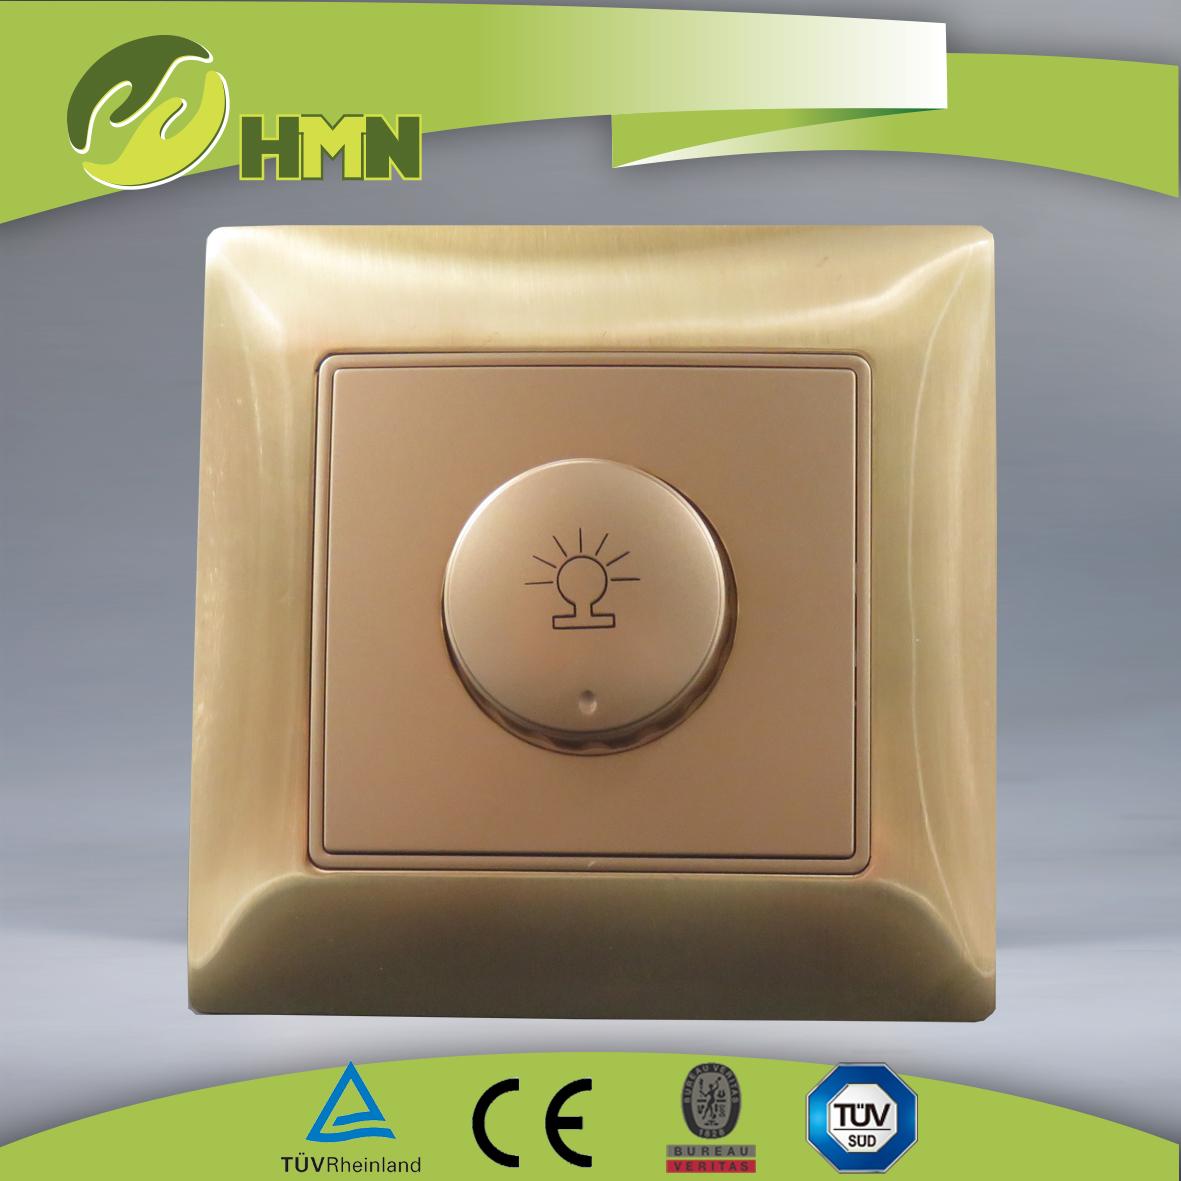 VZ109 Metal zinc lighting dimmer 500W